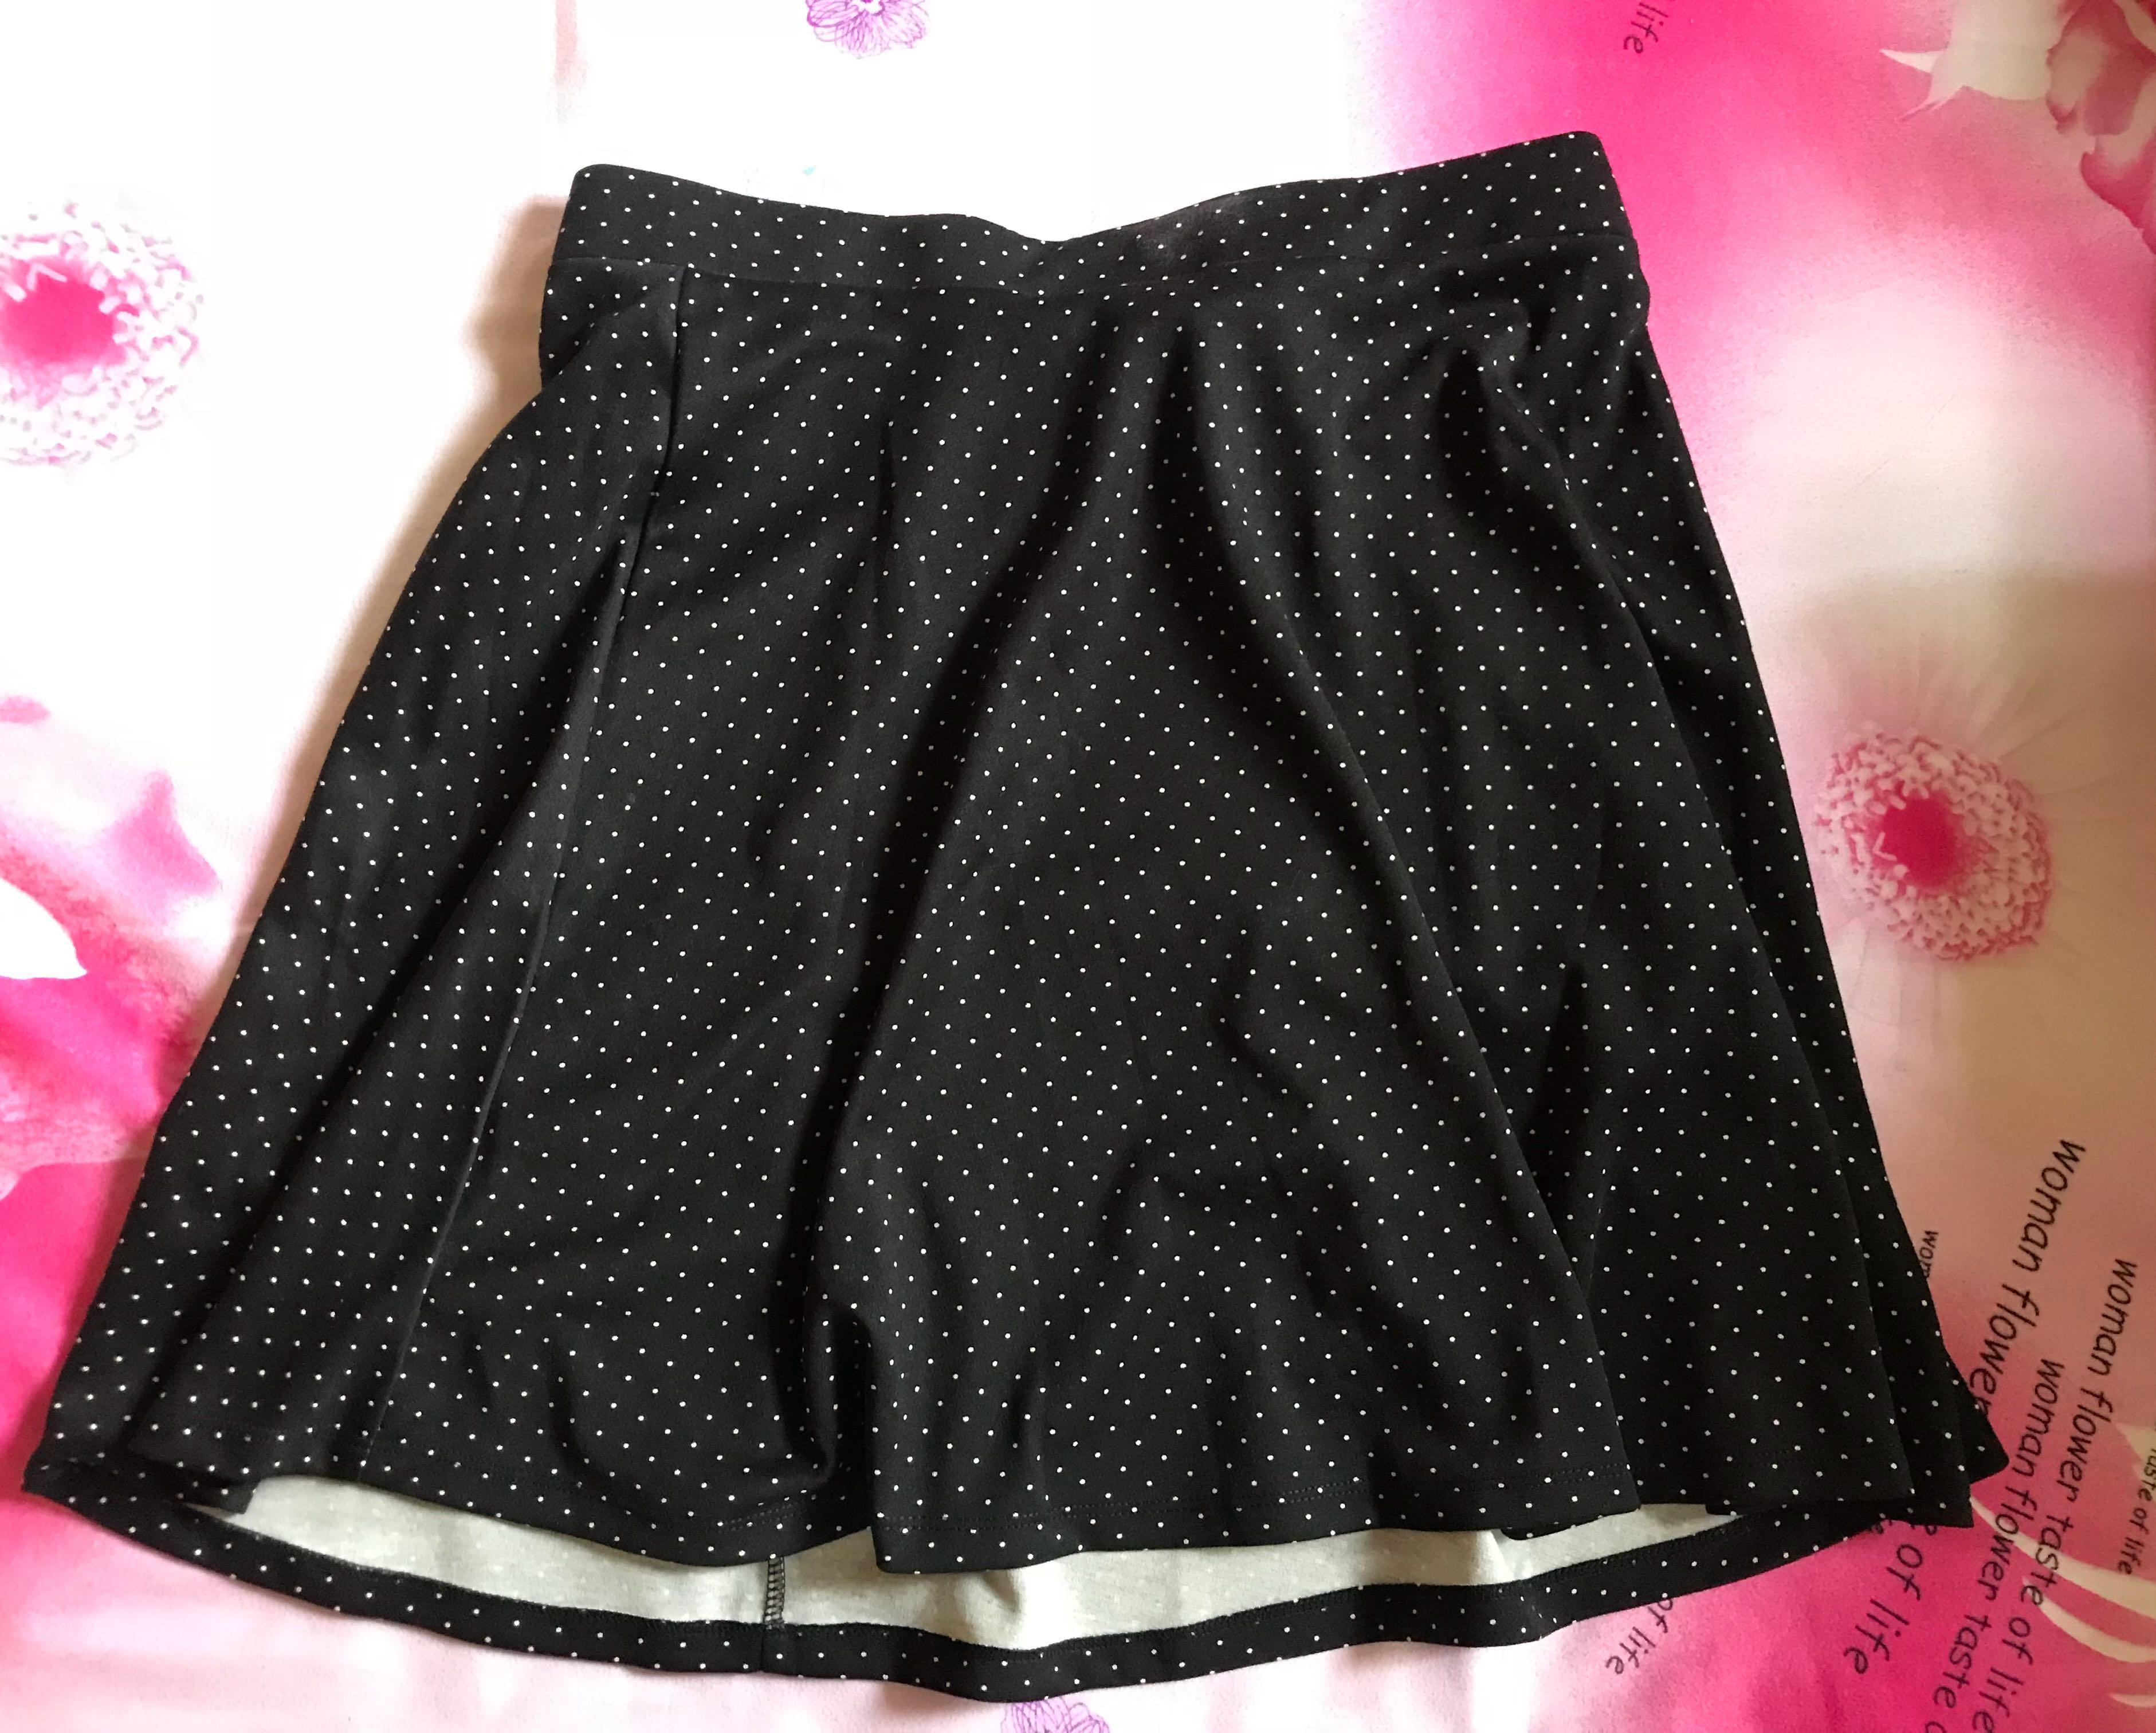 001cc38d336b Home · Women's Fashion · Clothes · Dresses & Skirts. photo photo photo photo